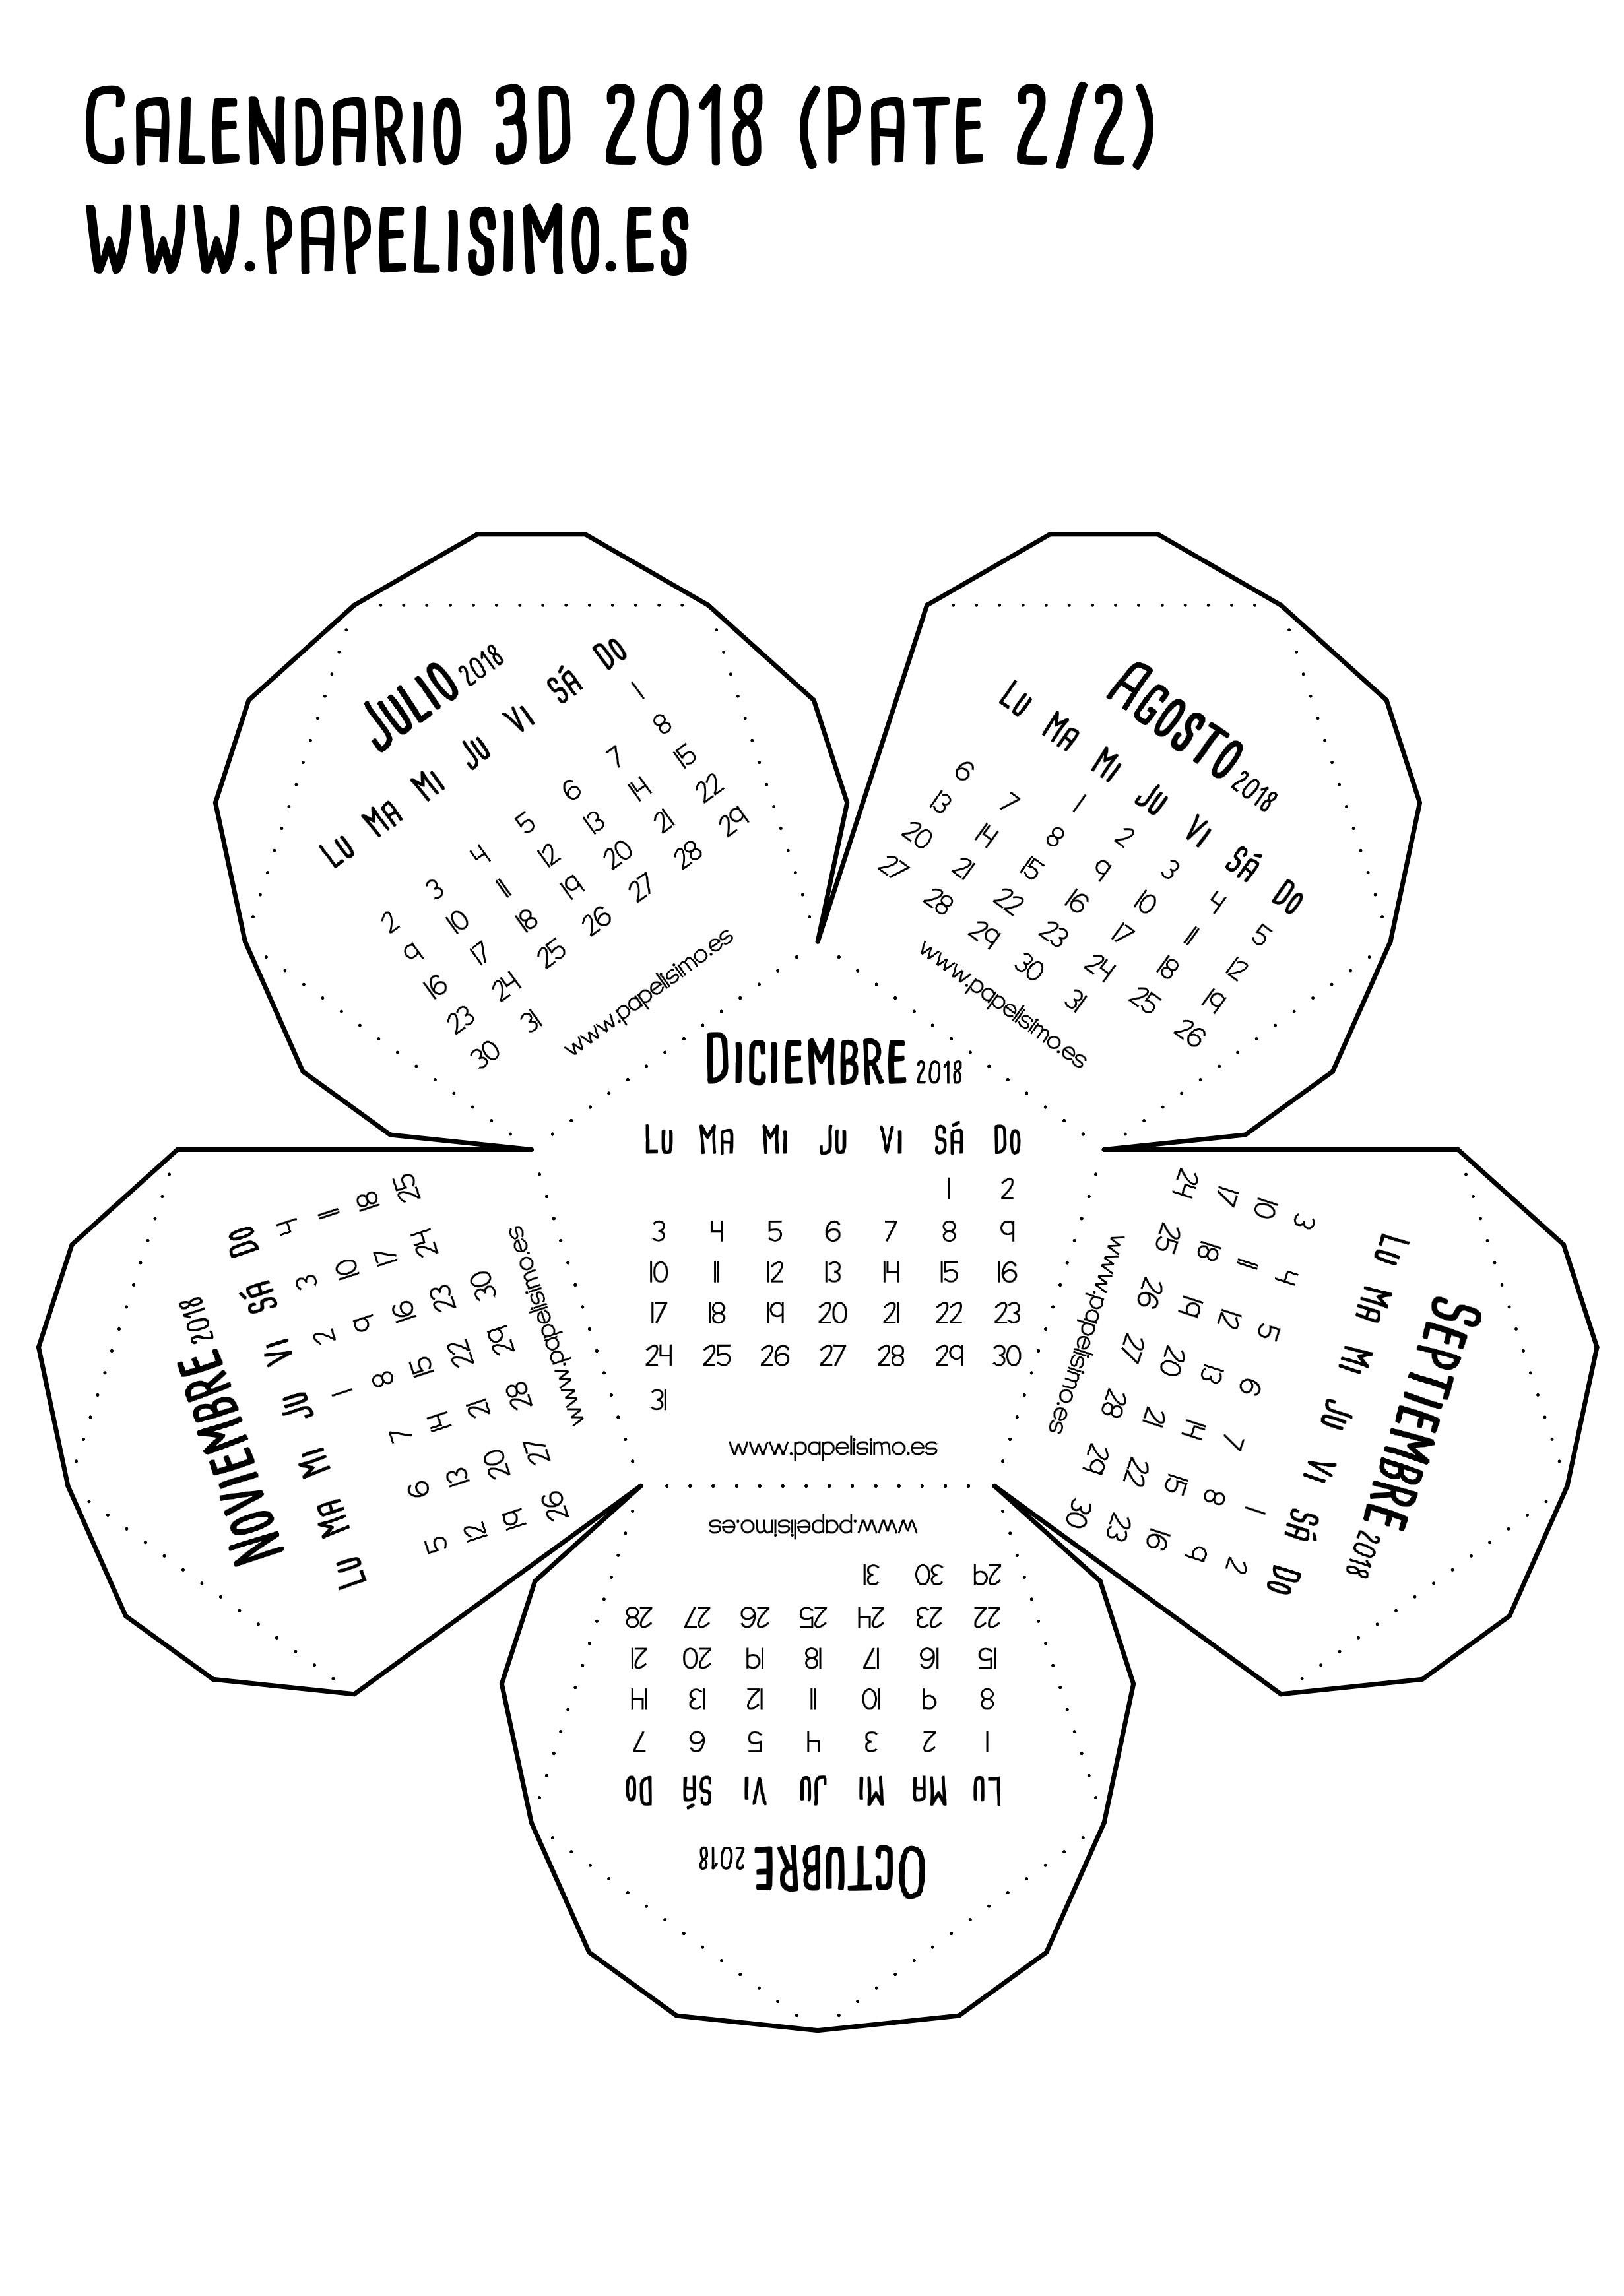 Calendario 3d 2018 pdf para imprimir Parte 2